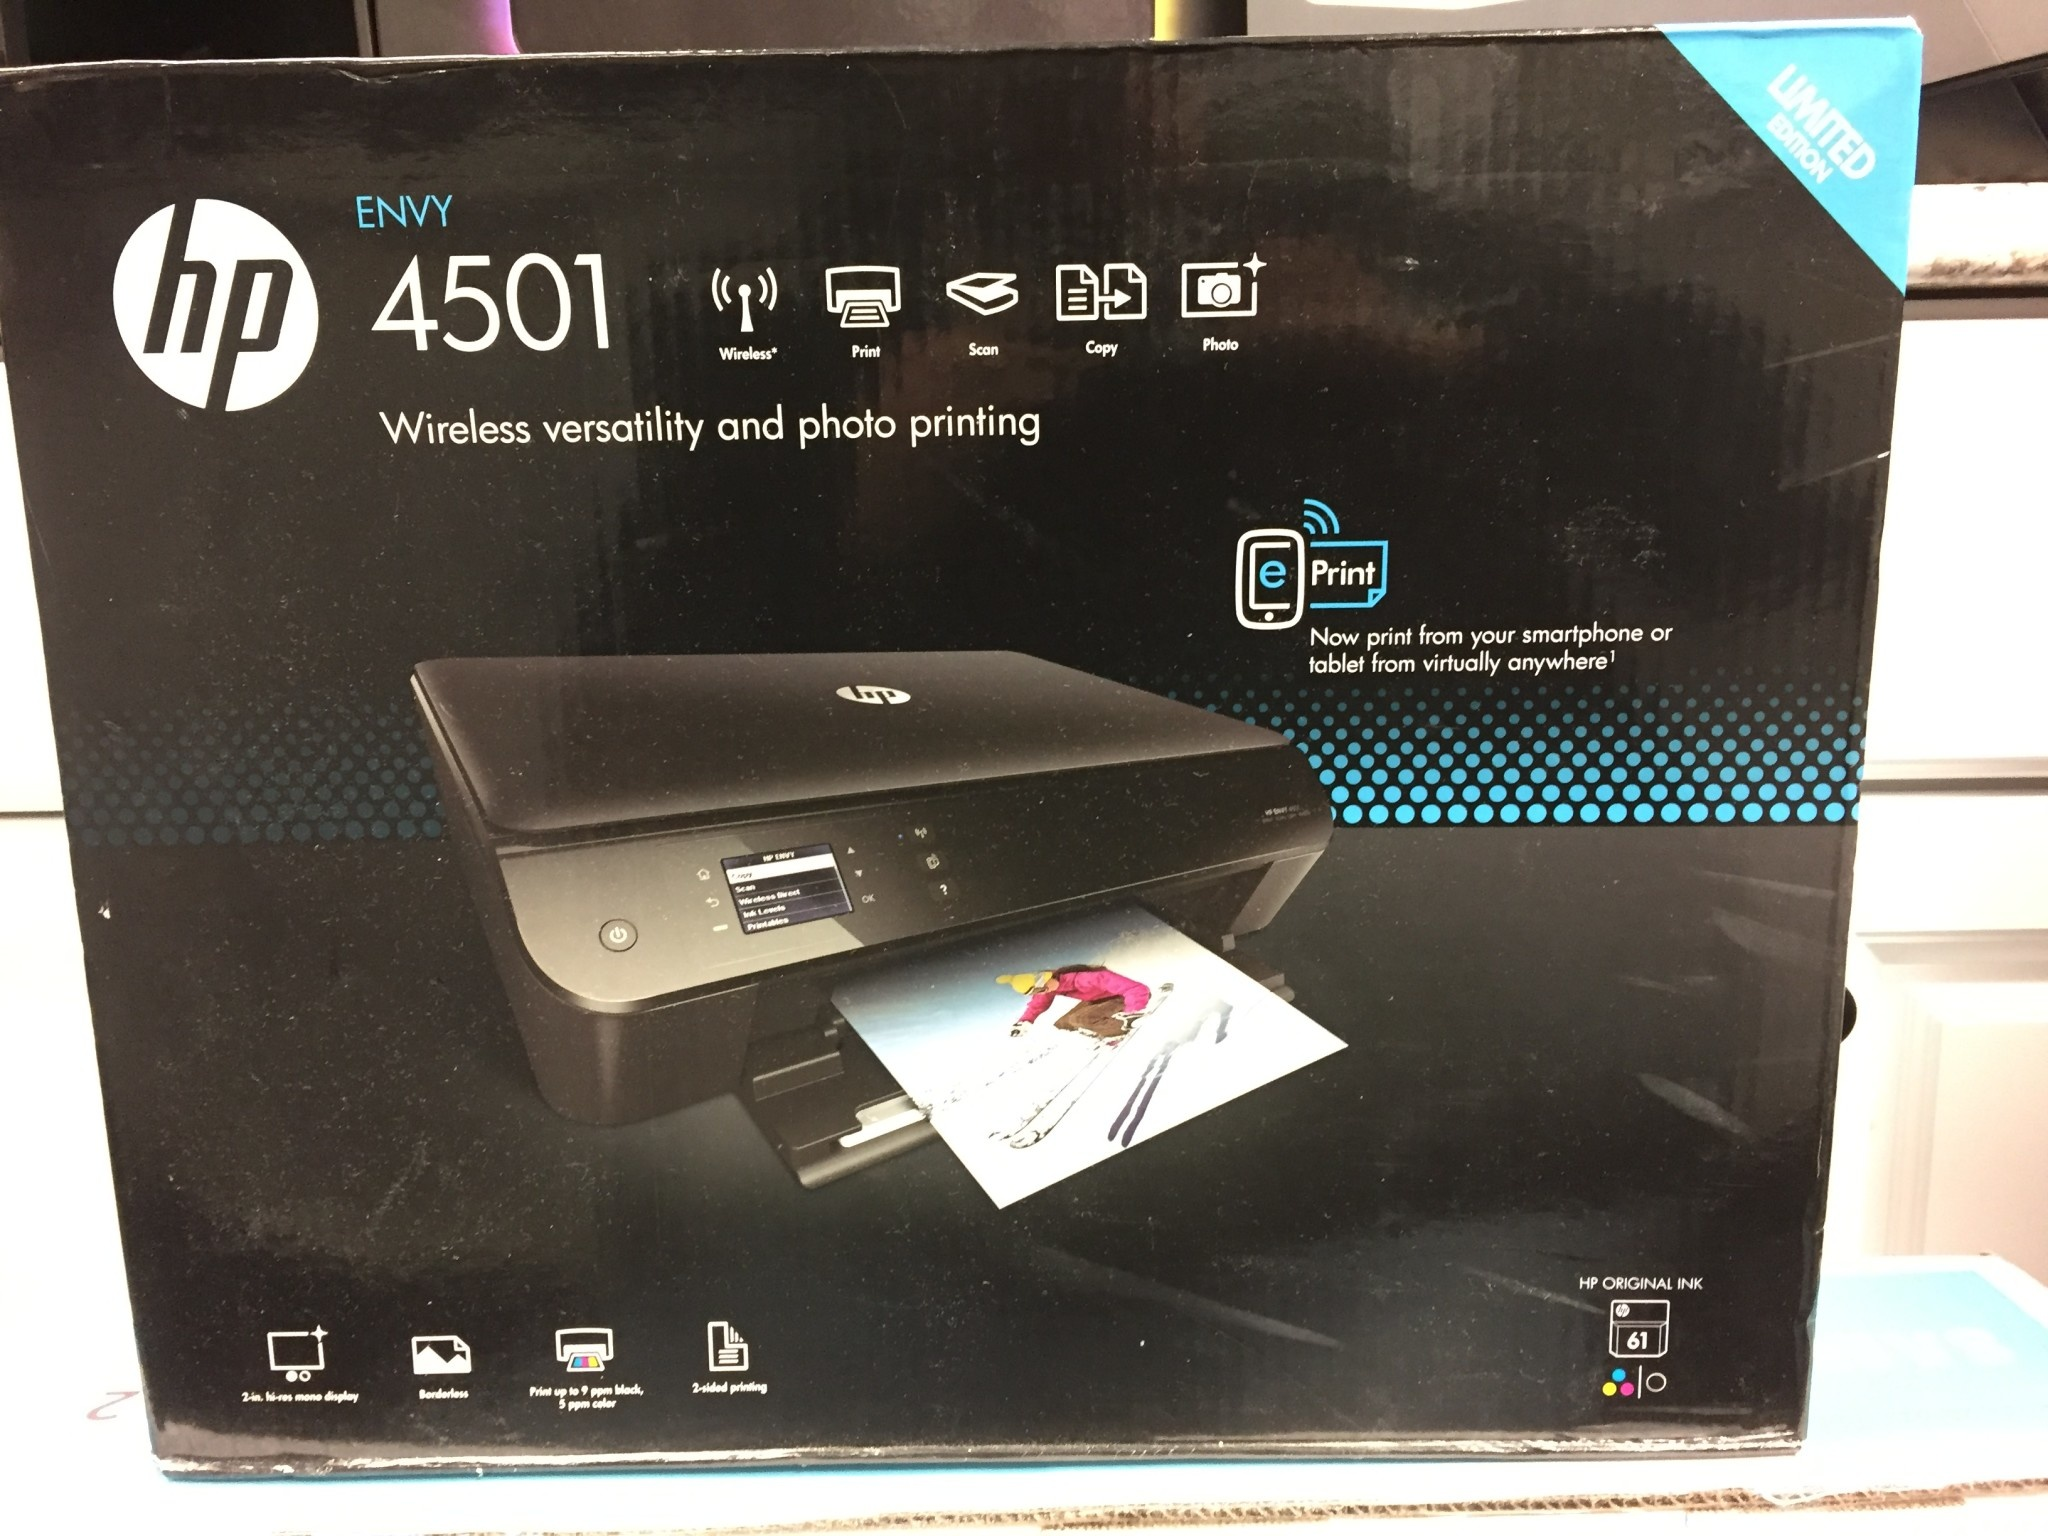 HP Envy 4501 e-All-in-One Inkjet Printer - C8D05A